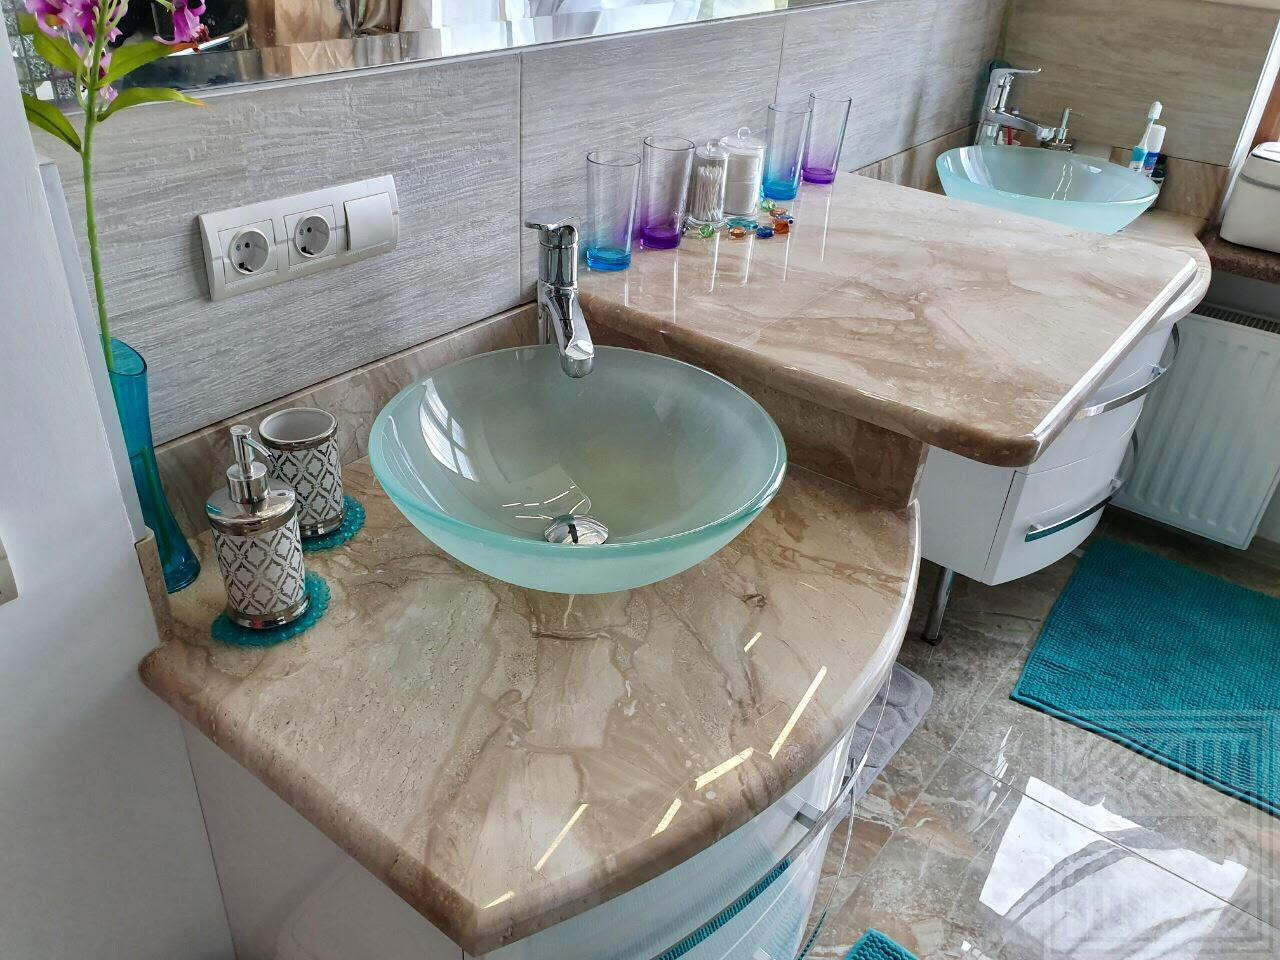 Столешница  с плинтусом в ванную комнату из мрамора Daino. worktop-marble - cnjktirf d dfyyjq